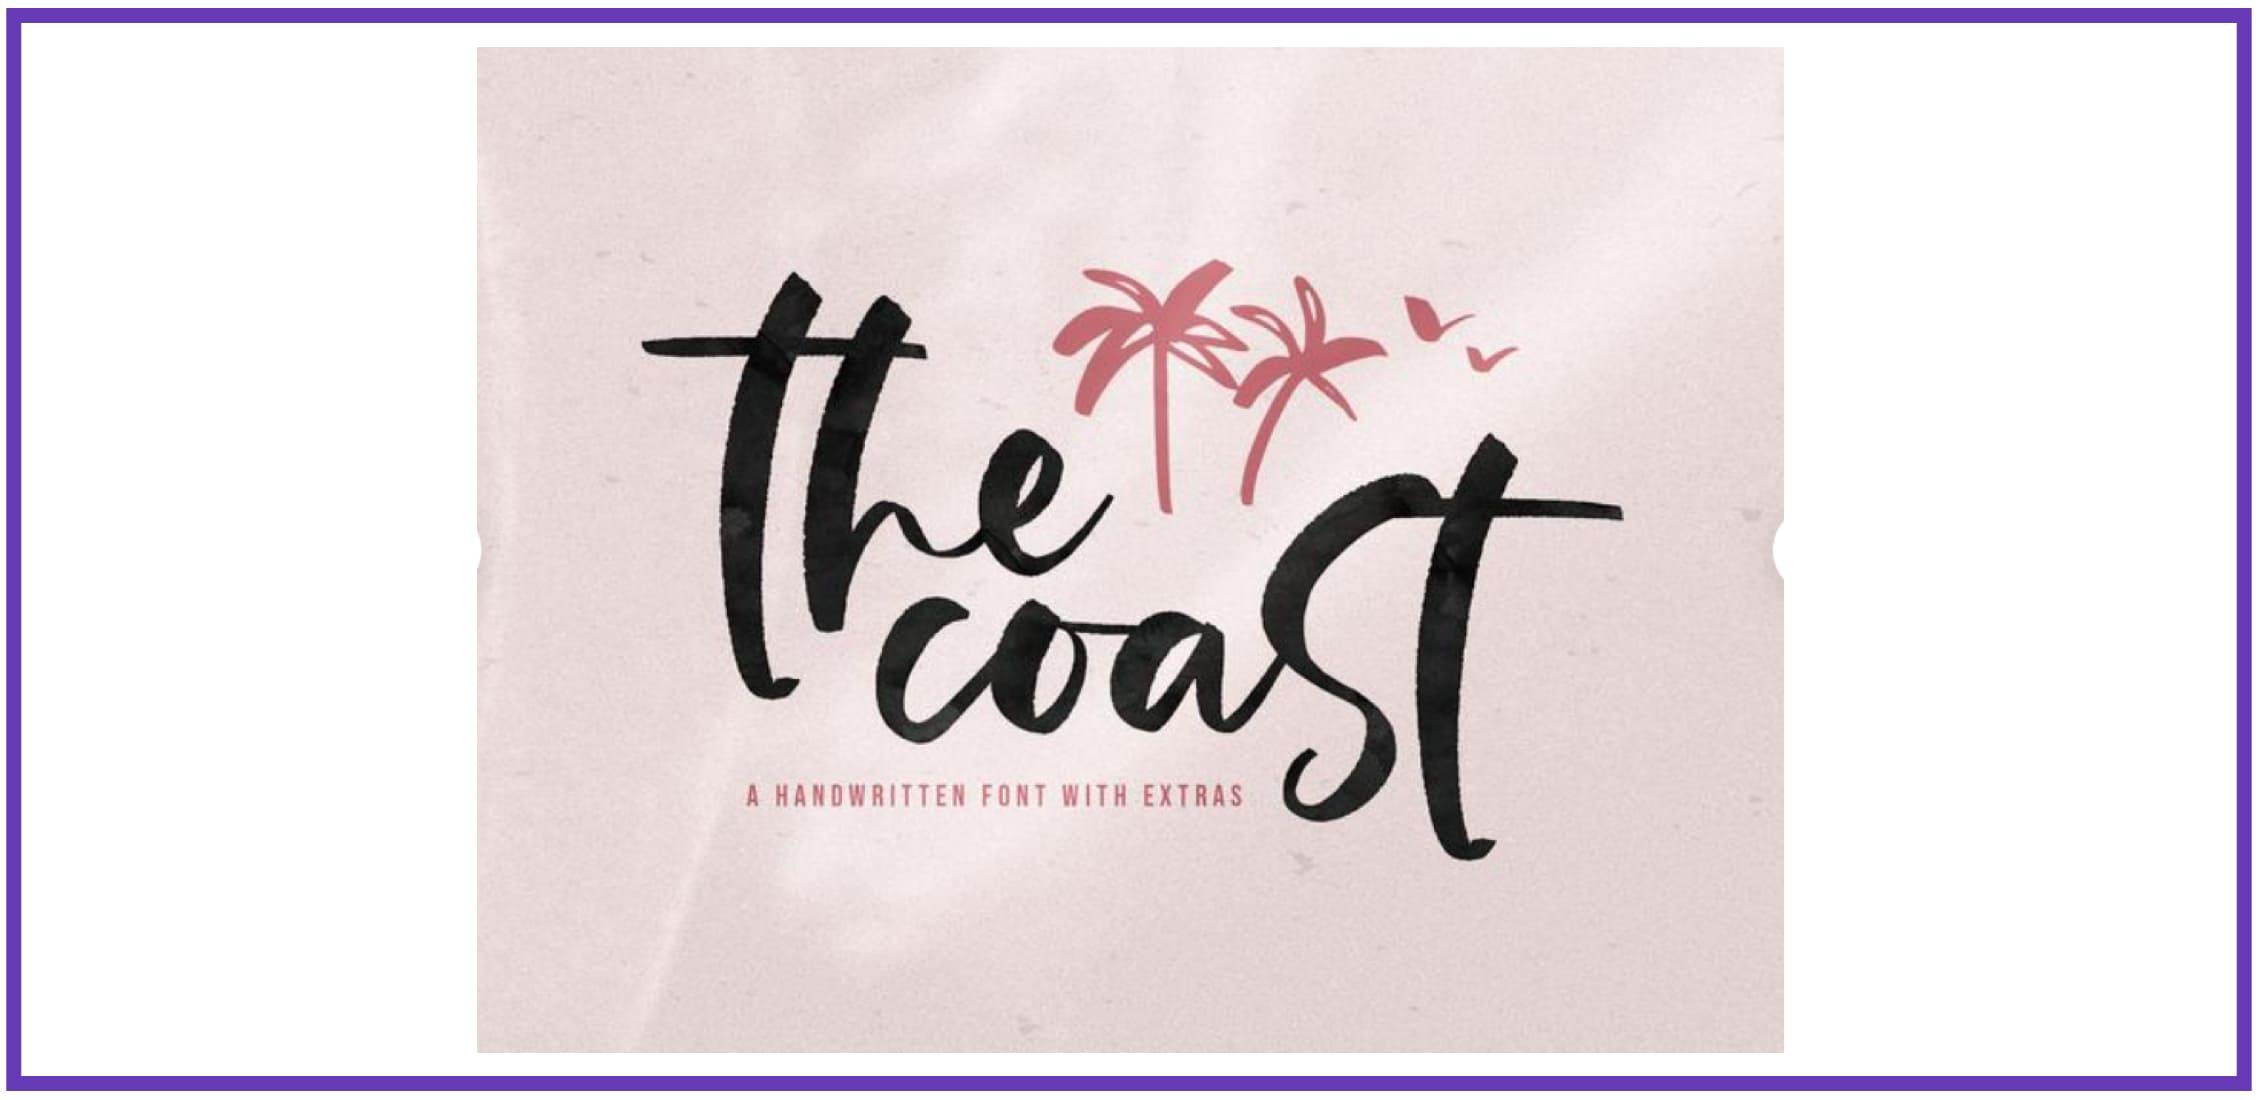 The Coast Font - Bold Handwritten Script Font. Tropical Font.